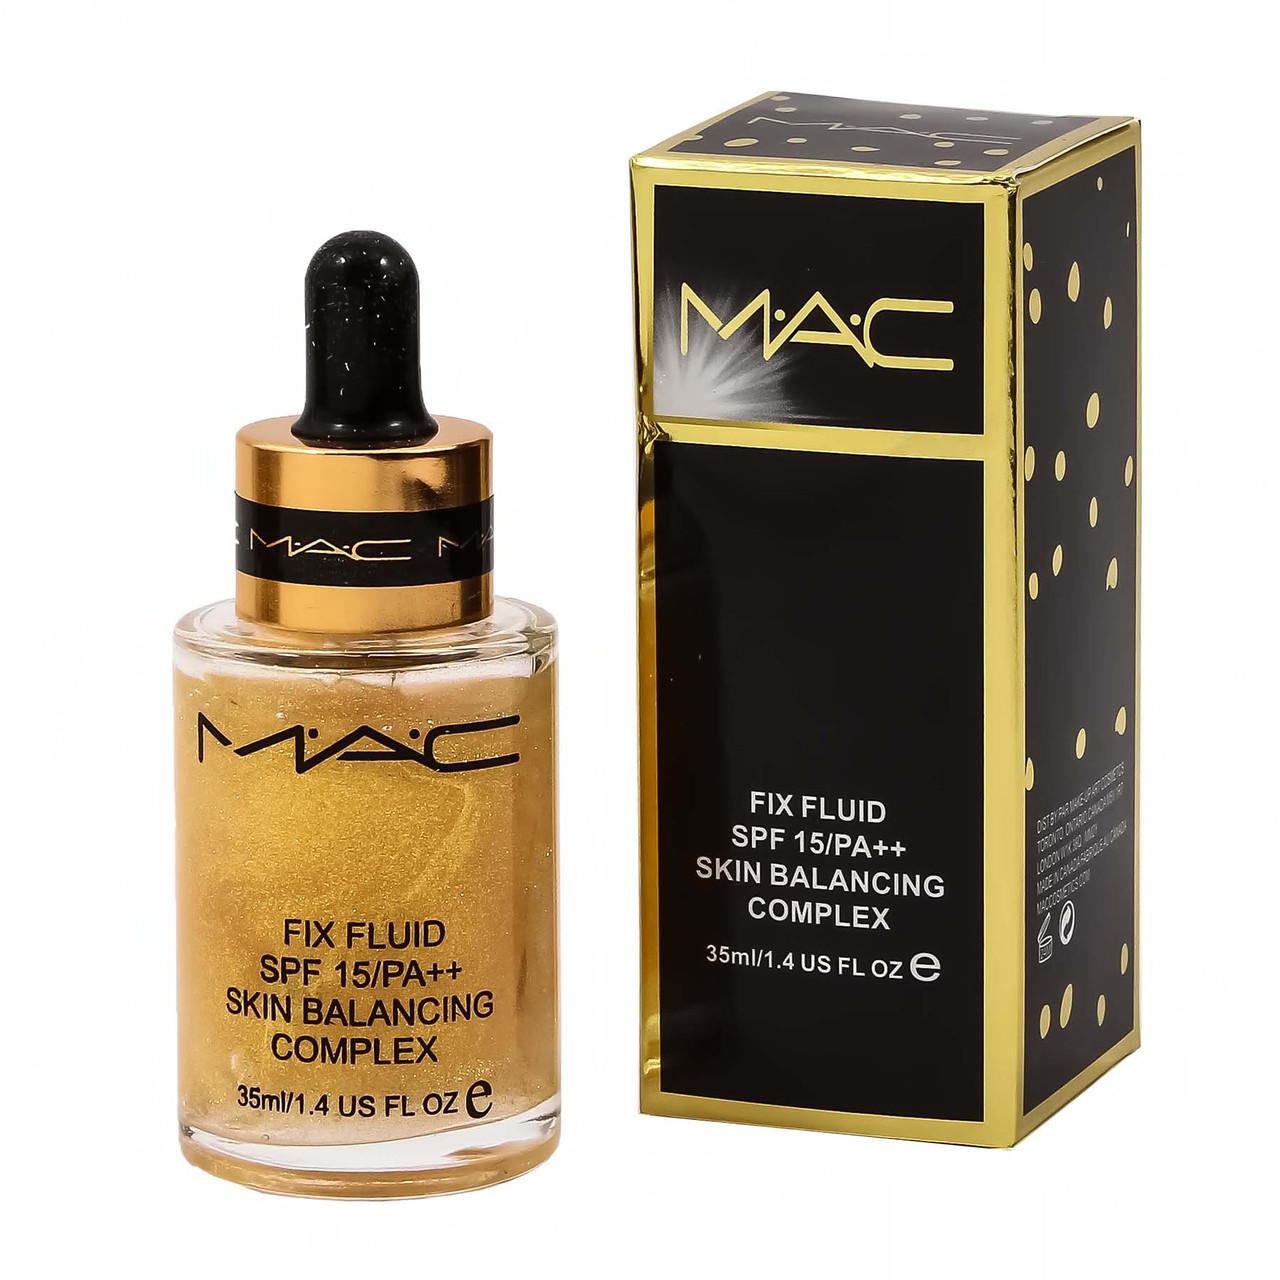 Масло-основа під макіяж MAC Serum Fix Fluid spf 15+, Skin Balancing Complex